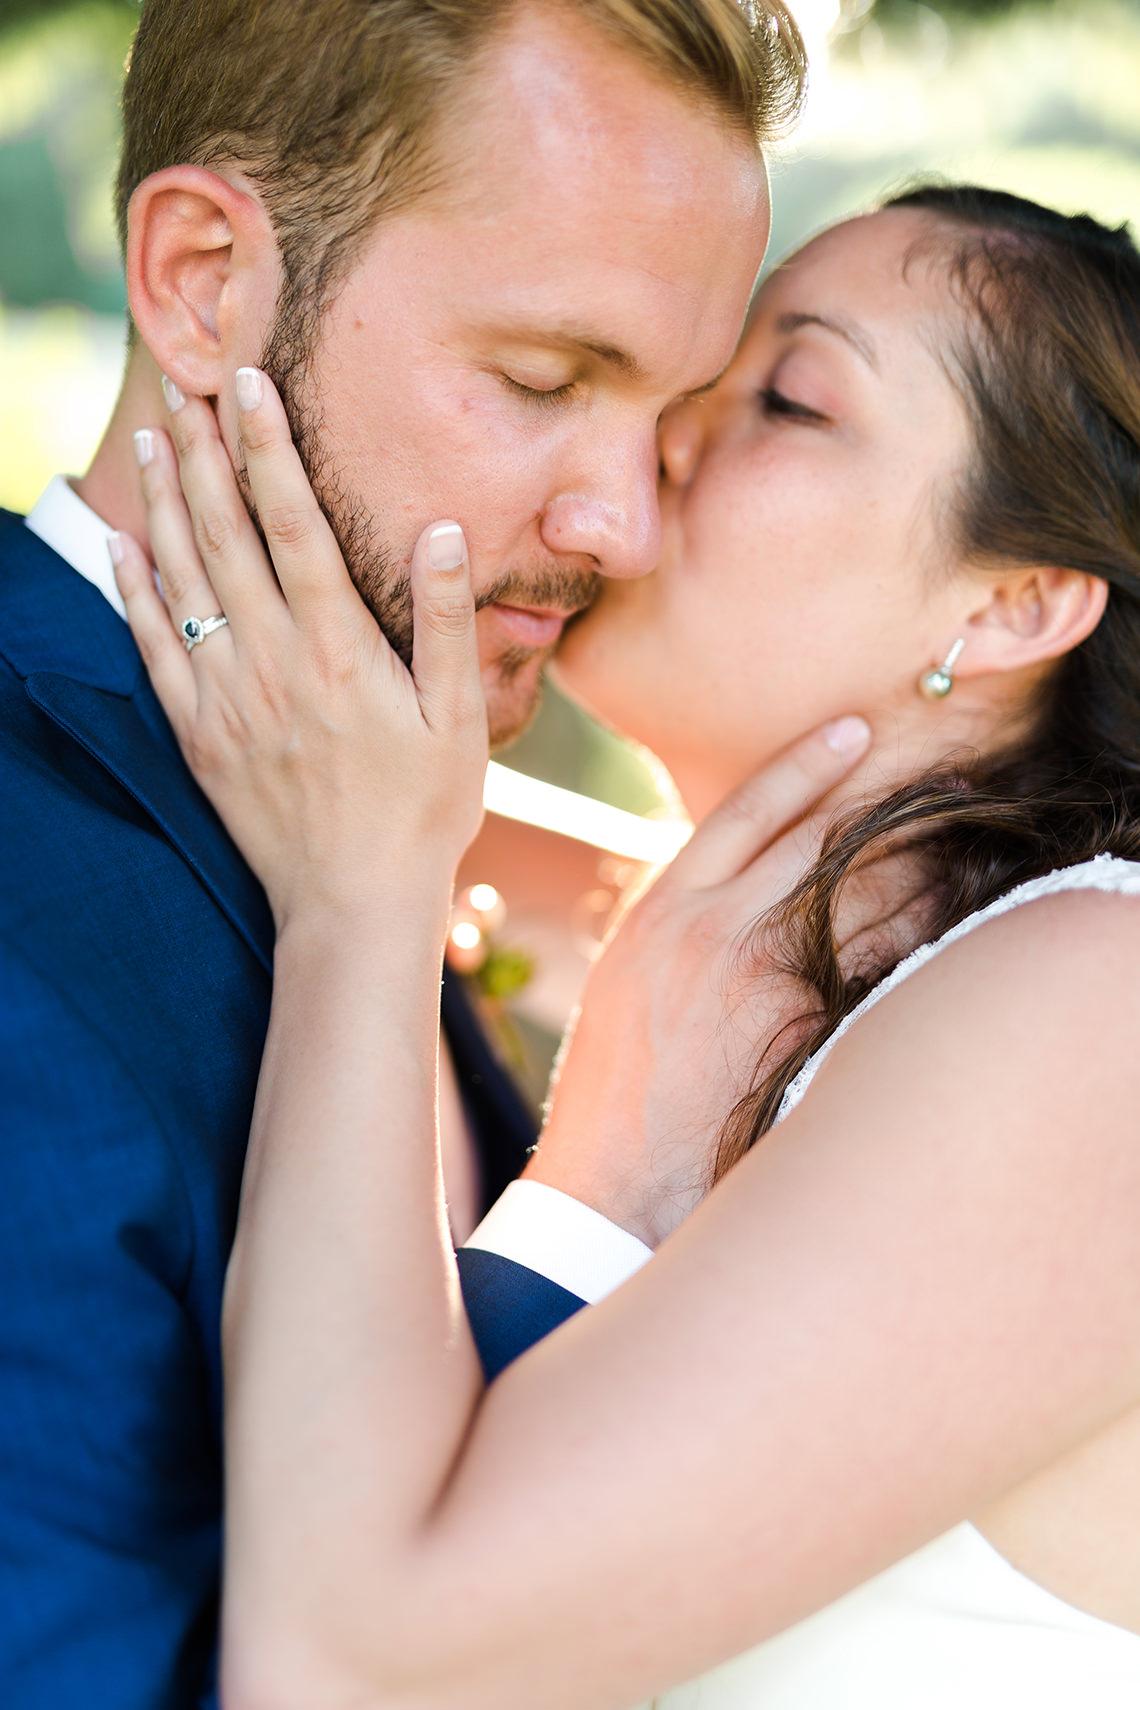 bisou tendresse mariés mariage cergy